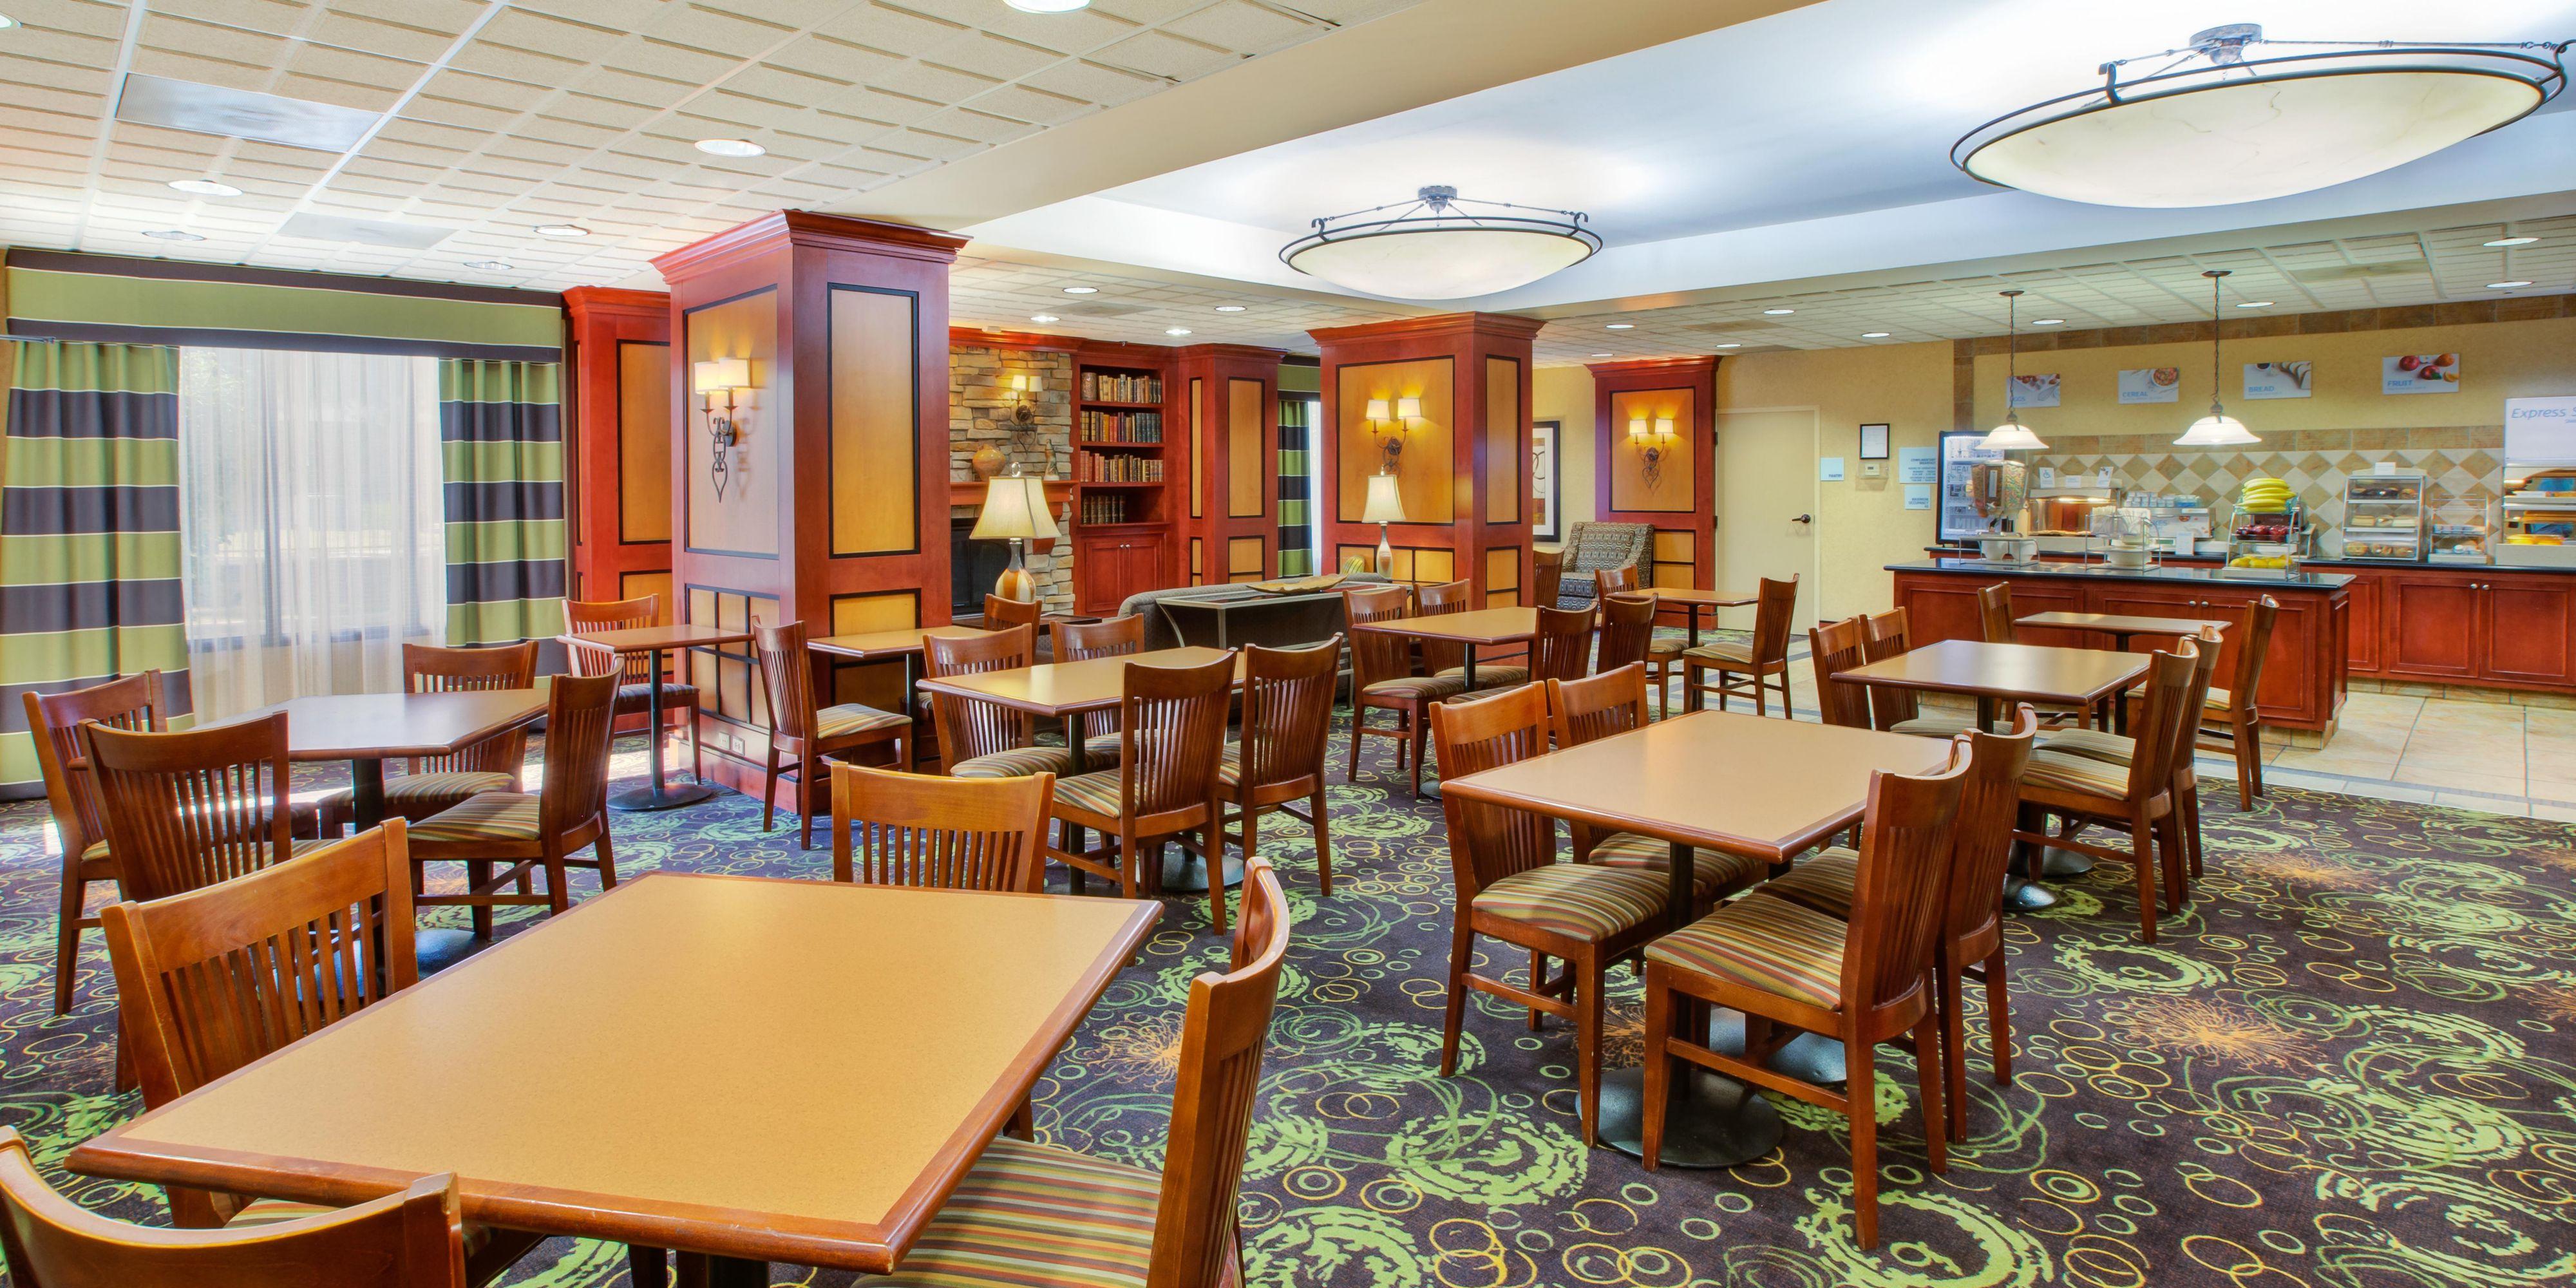 Holiday Inn Express & Suites Fort Wayne Hotel in Fort Wayne by IHG